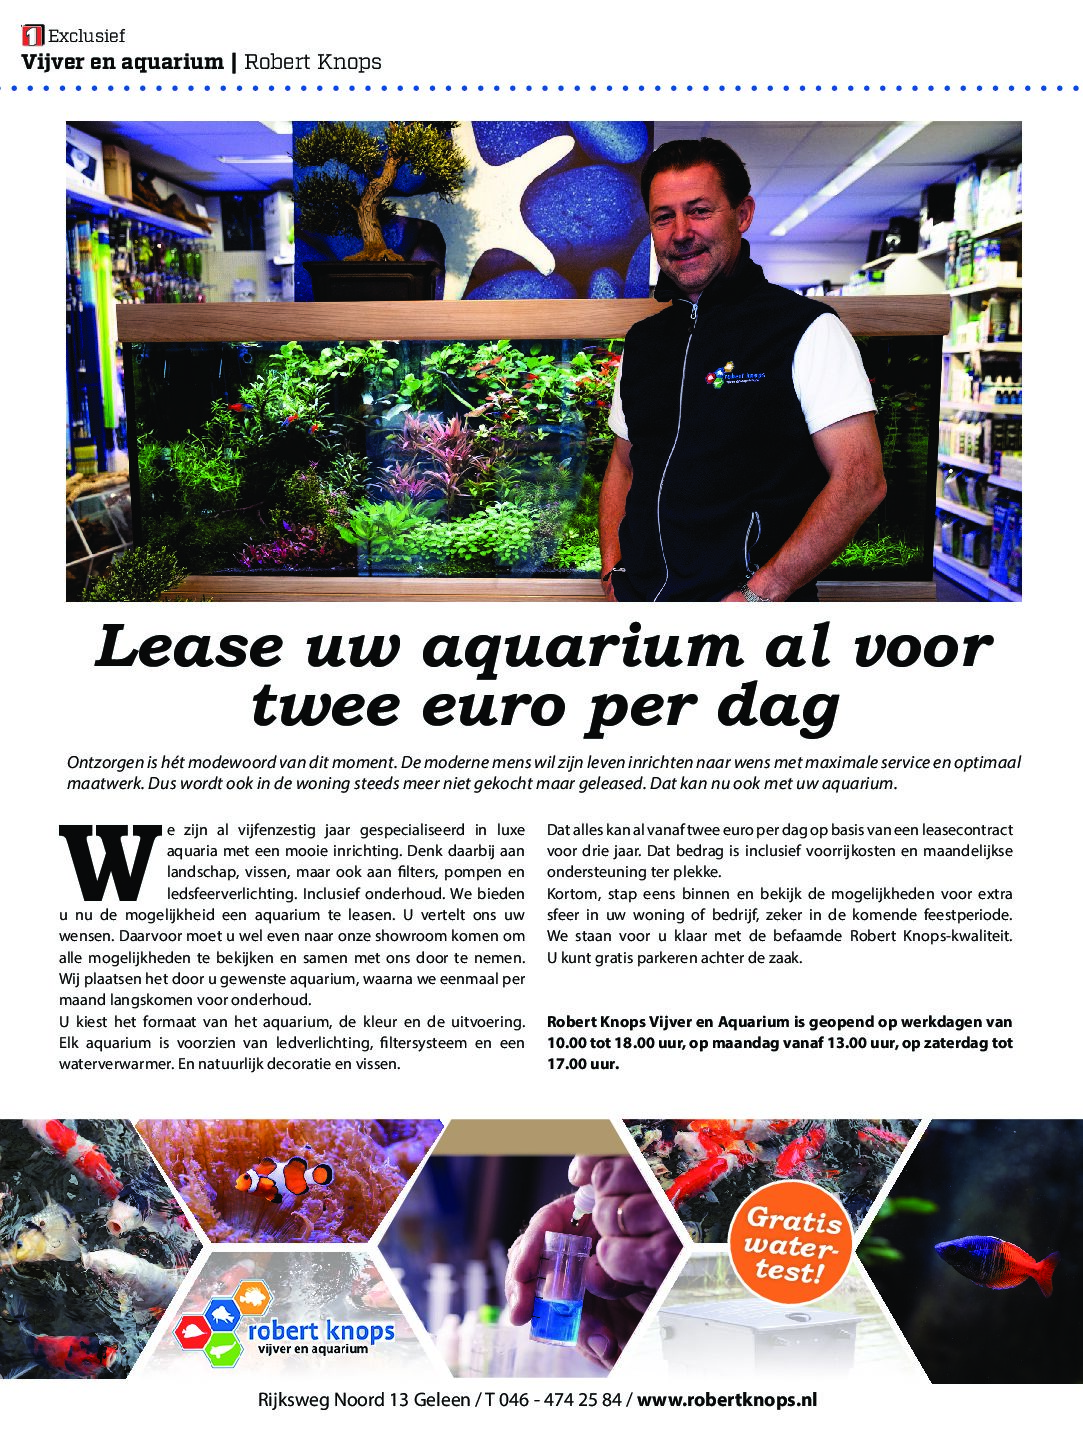 https://www.robertknops.nl/wp-content/uploads/NR1_RK_2-1-pdf.jpg